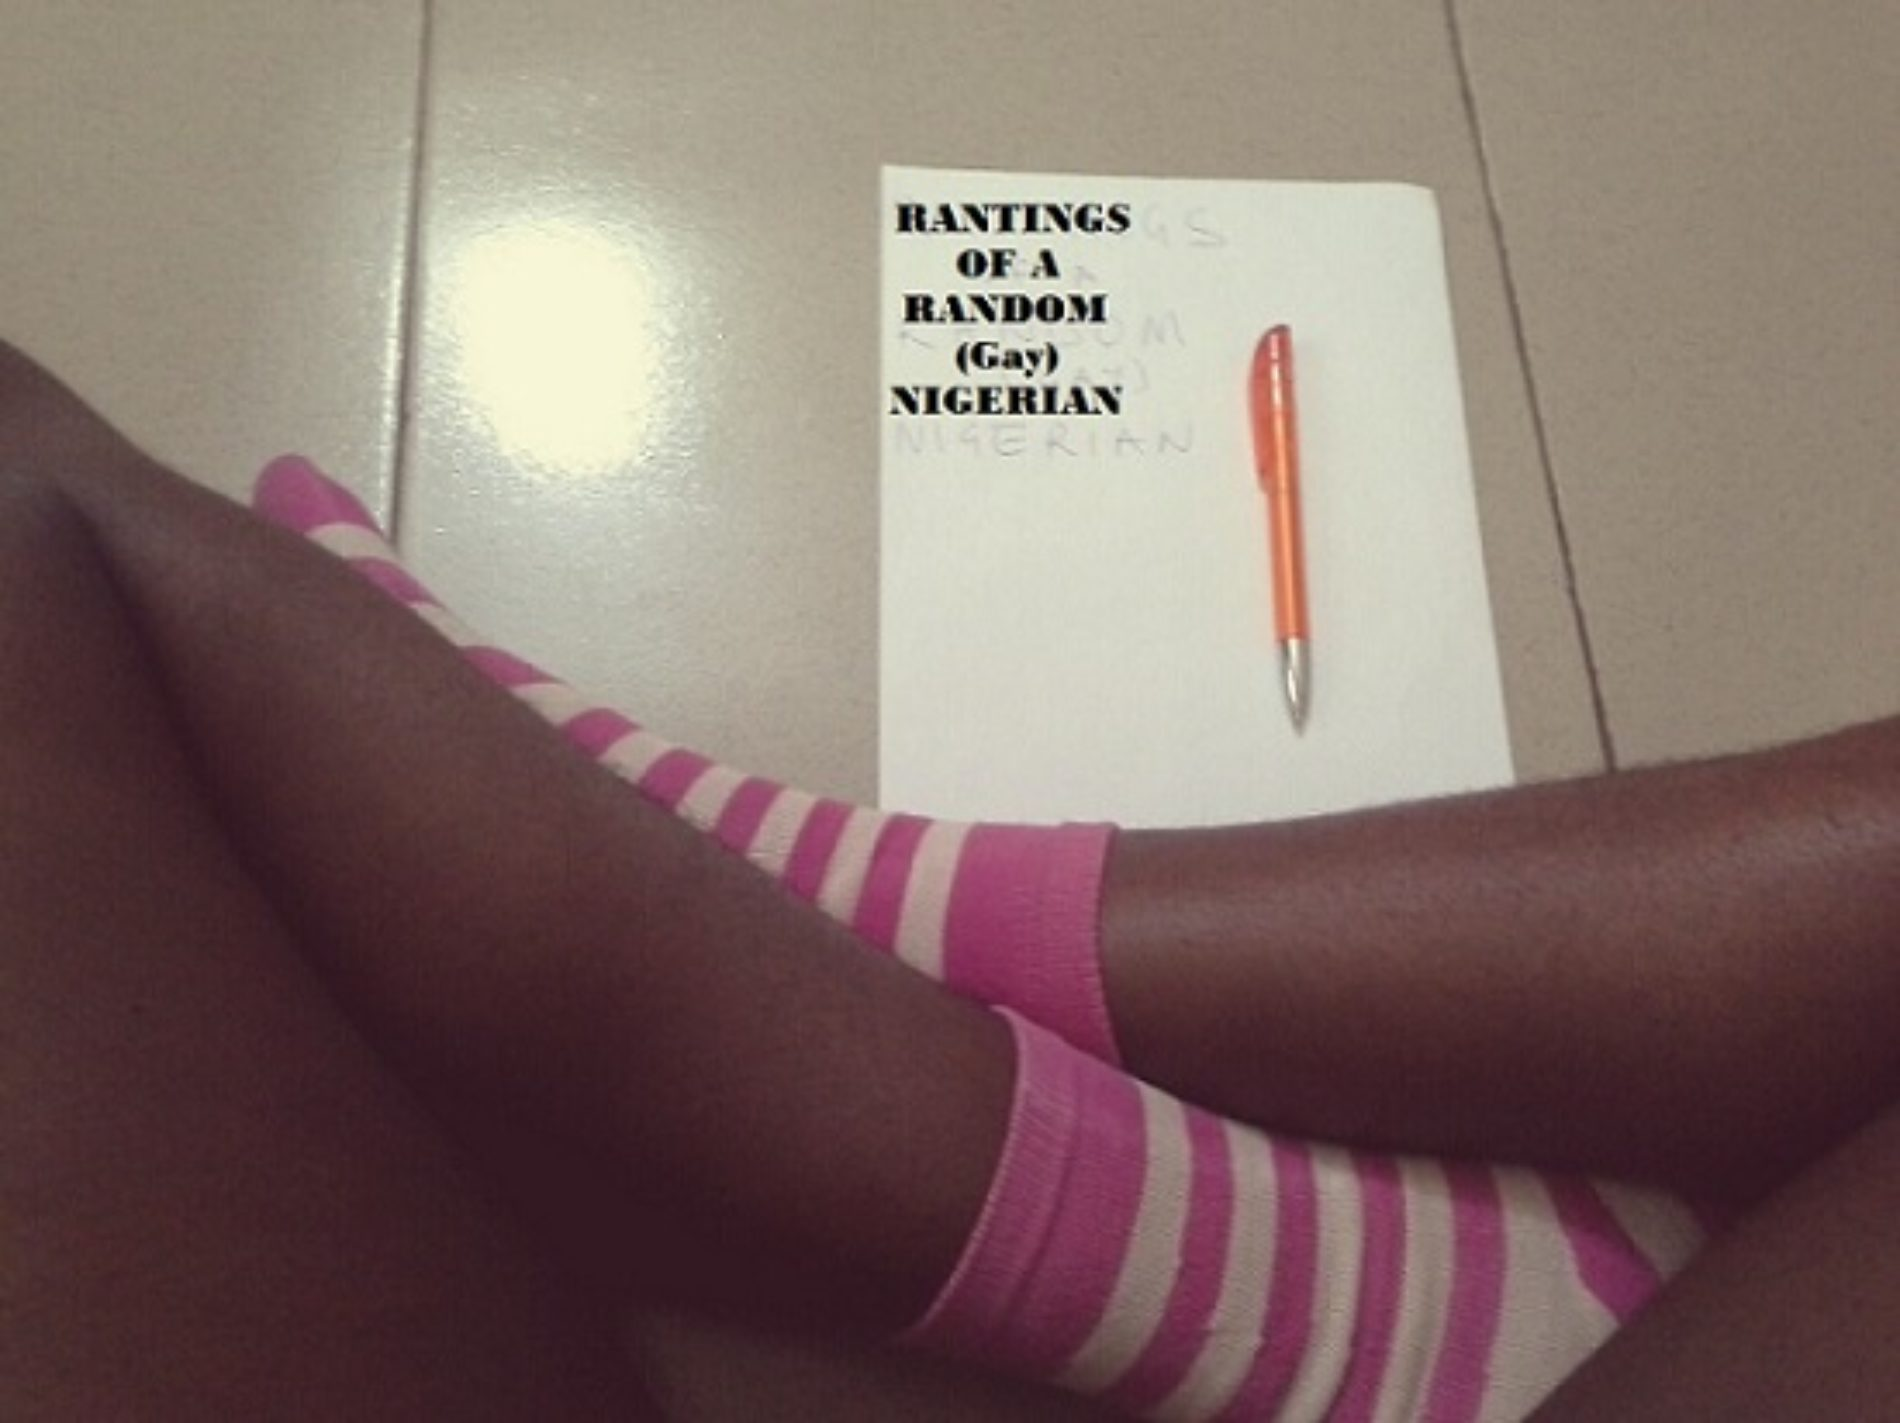 RANTINGS OF A RANDOM (Gay) NIGERIAN (Entry 61)